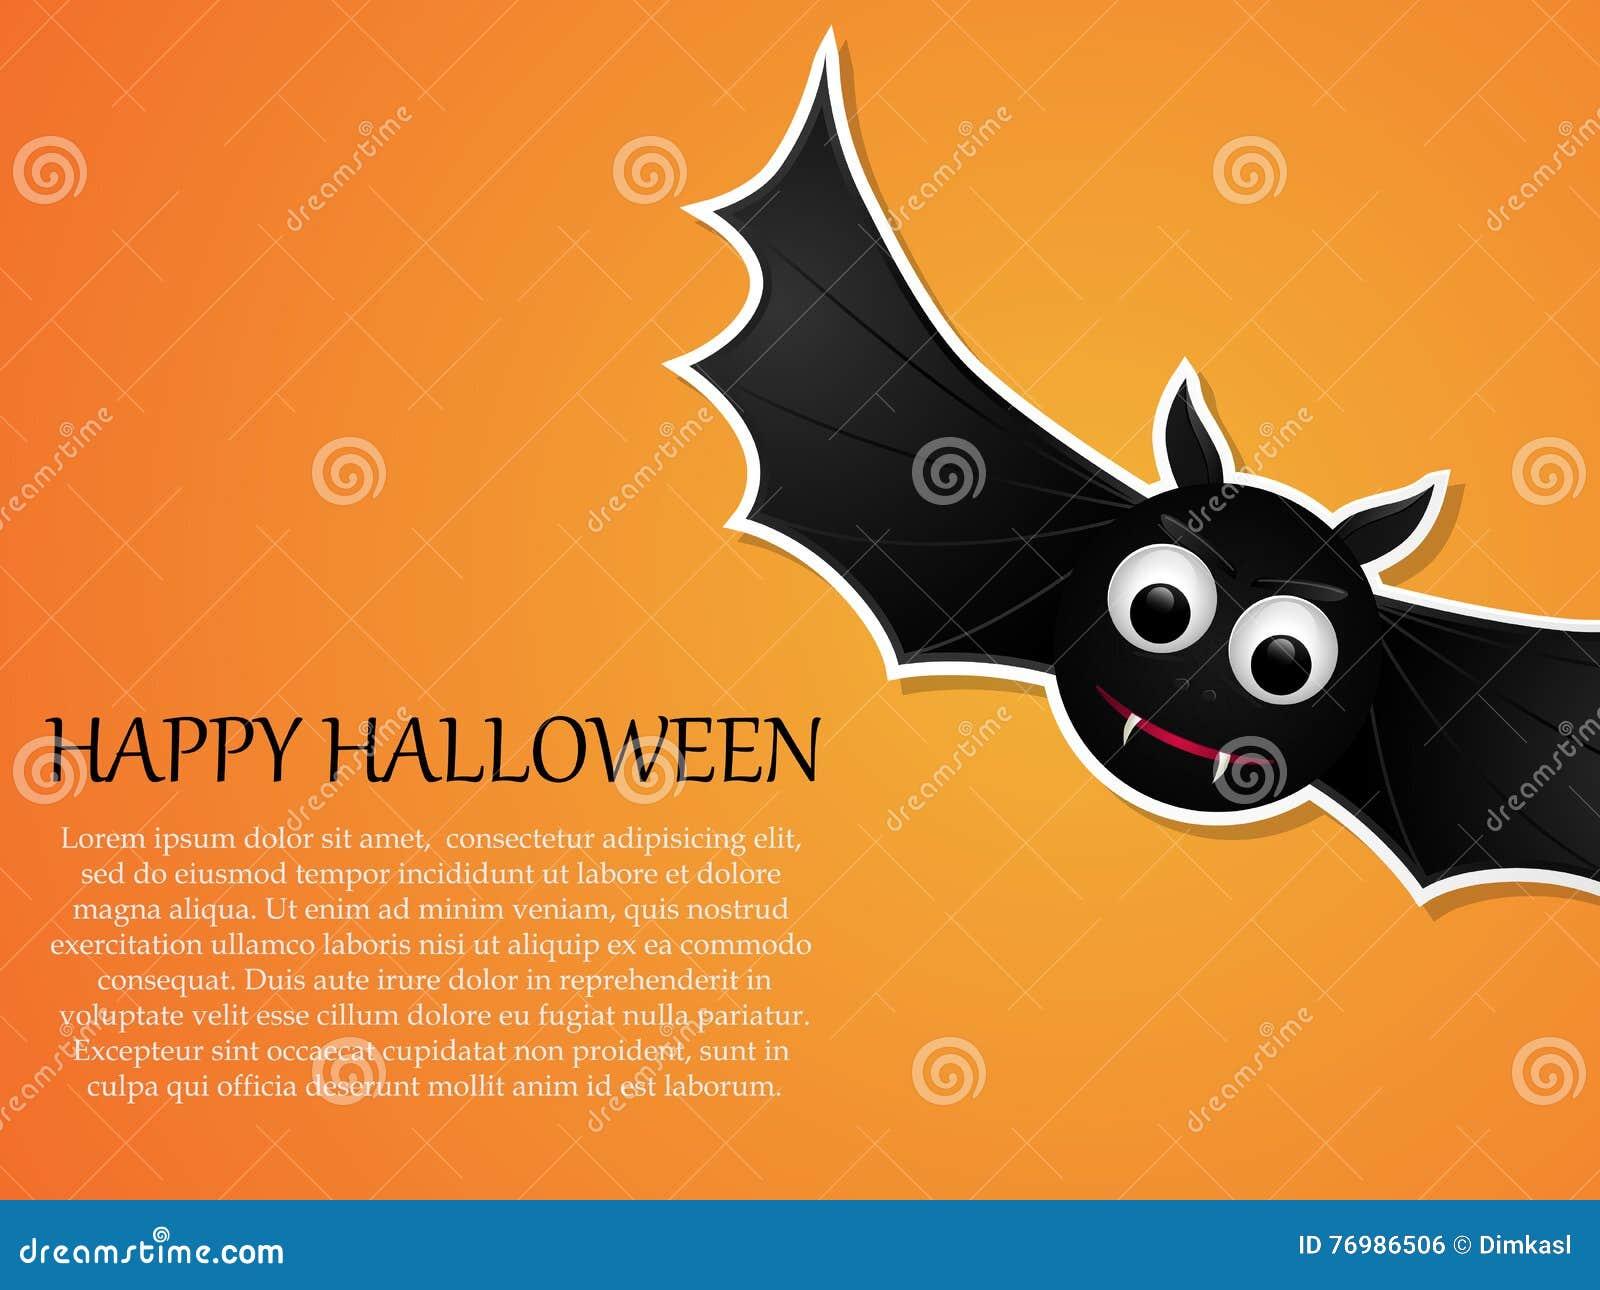 happy halloween orange background with flying bat design template